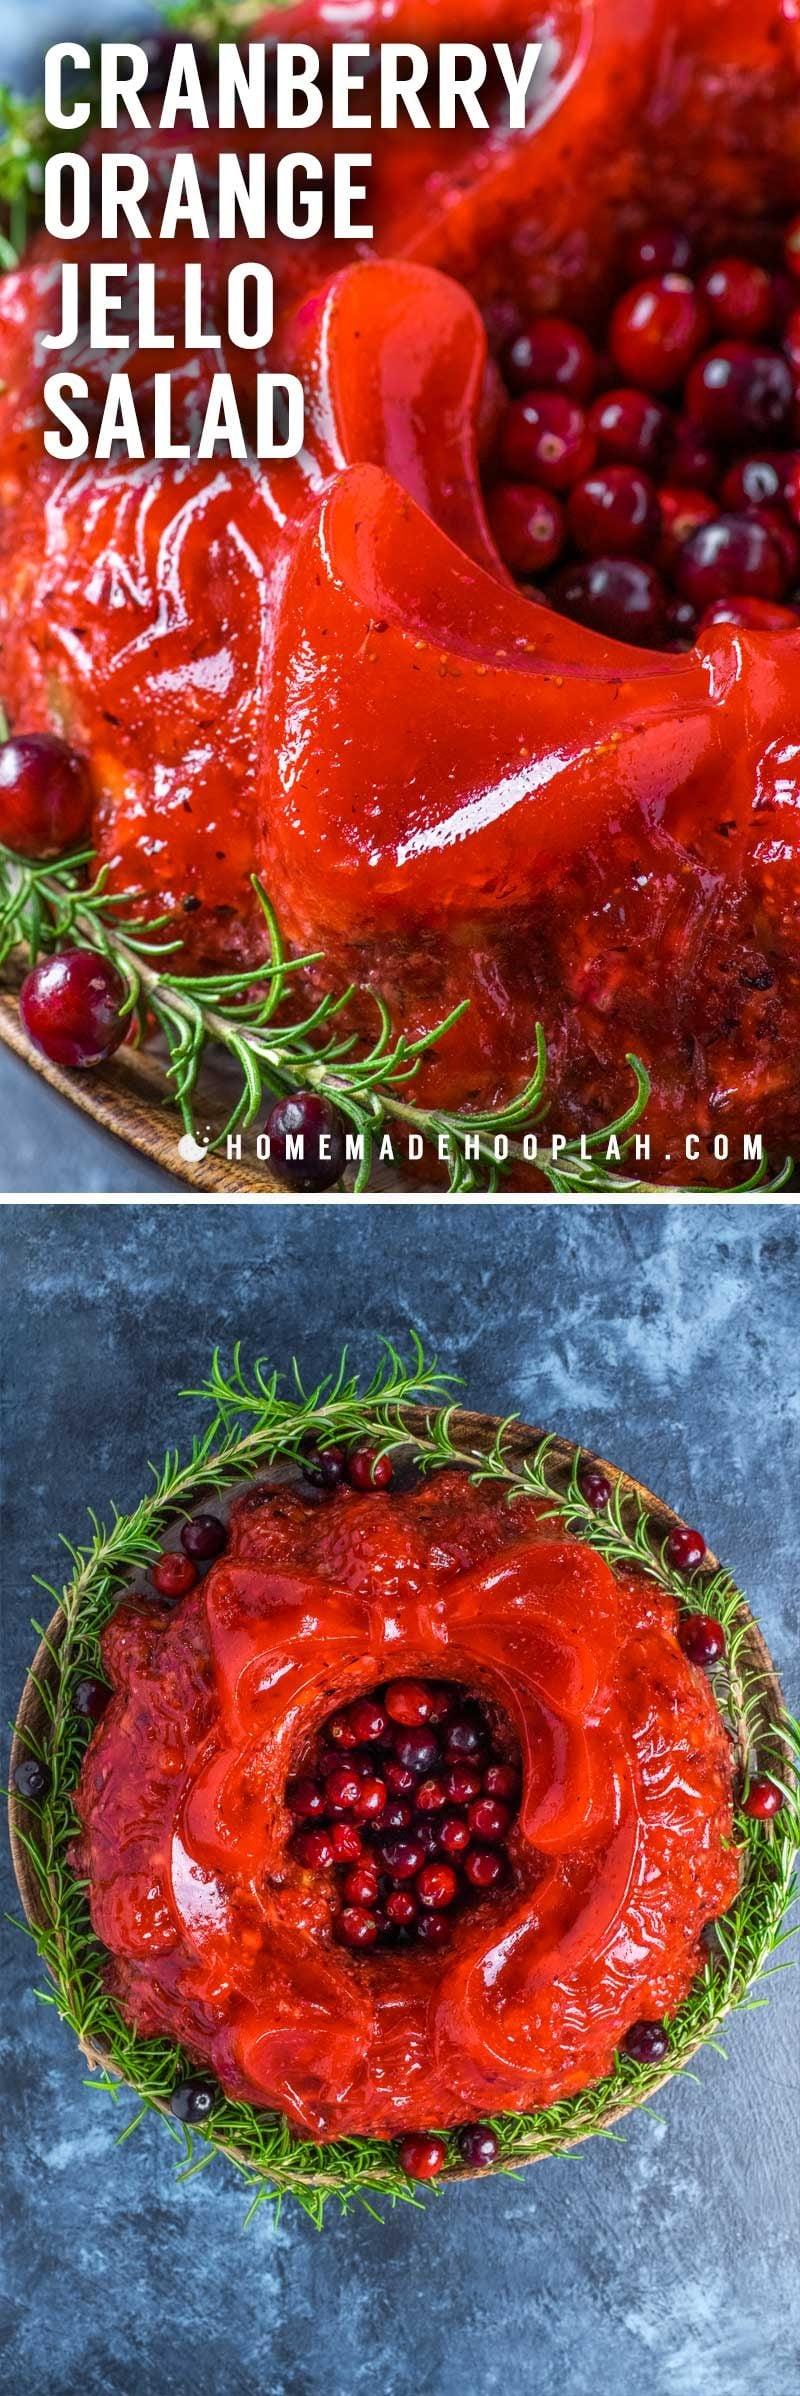 Salad Jello Raspberry Walnuts Cranberry